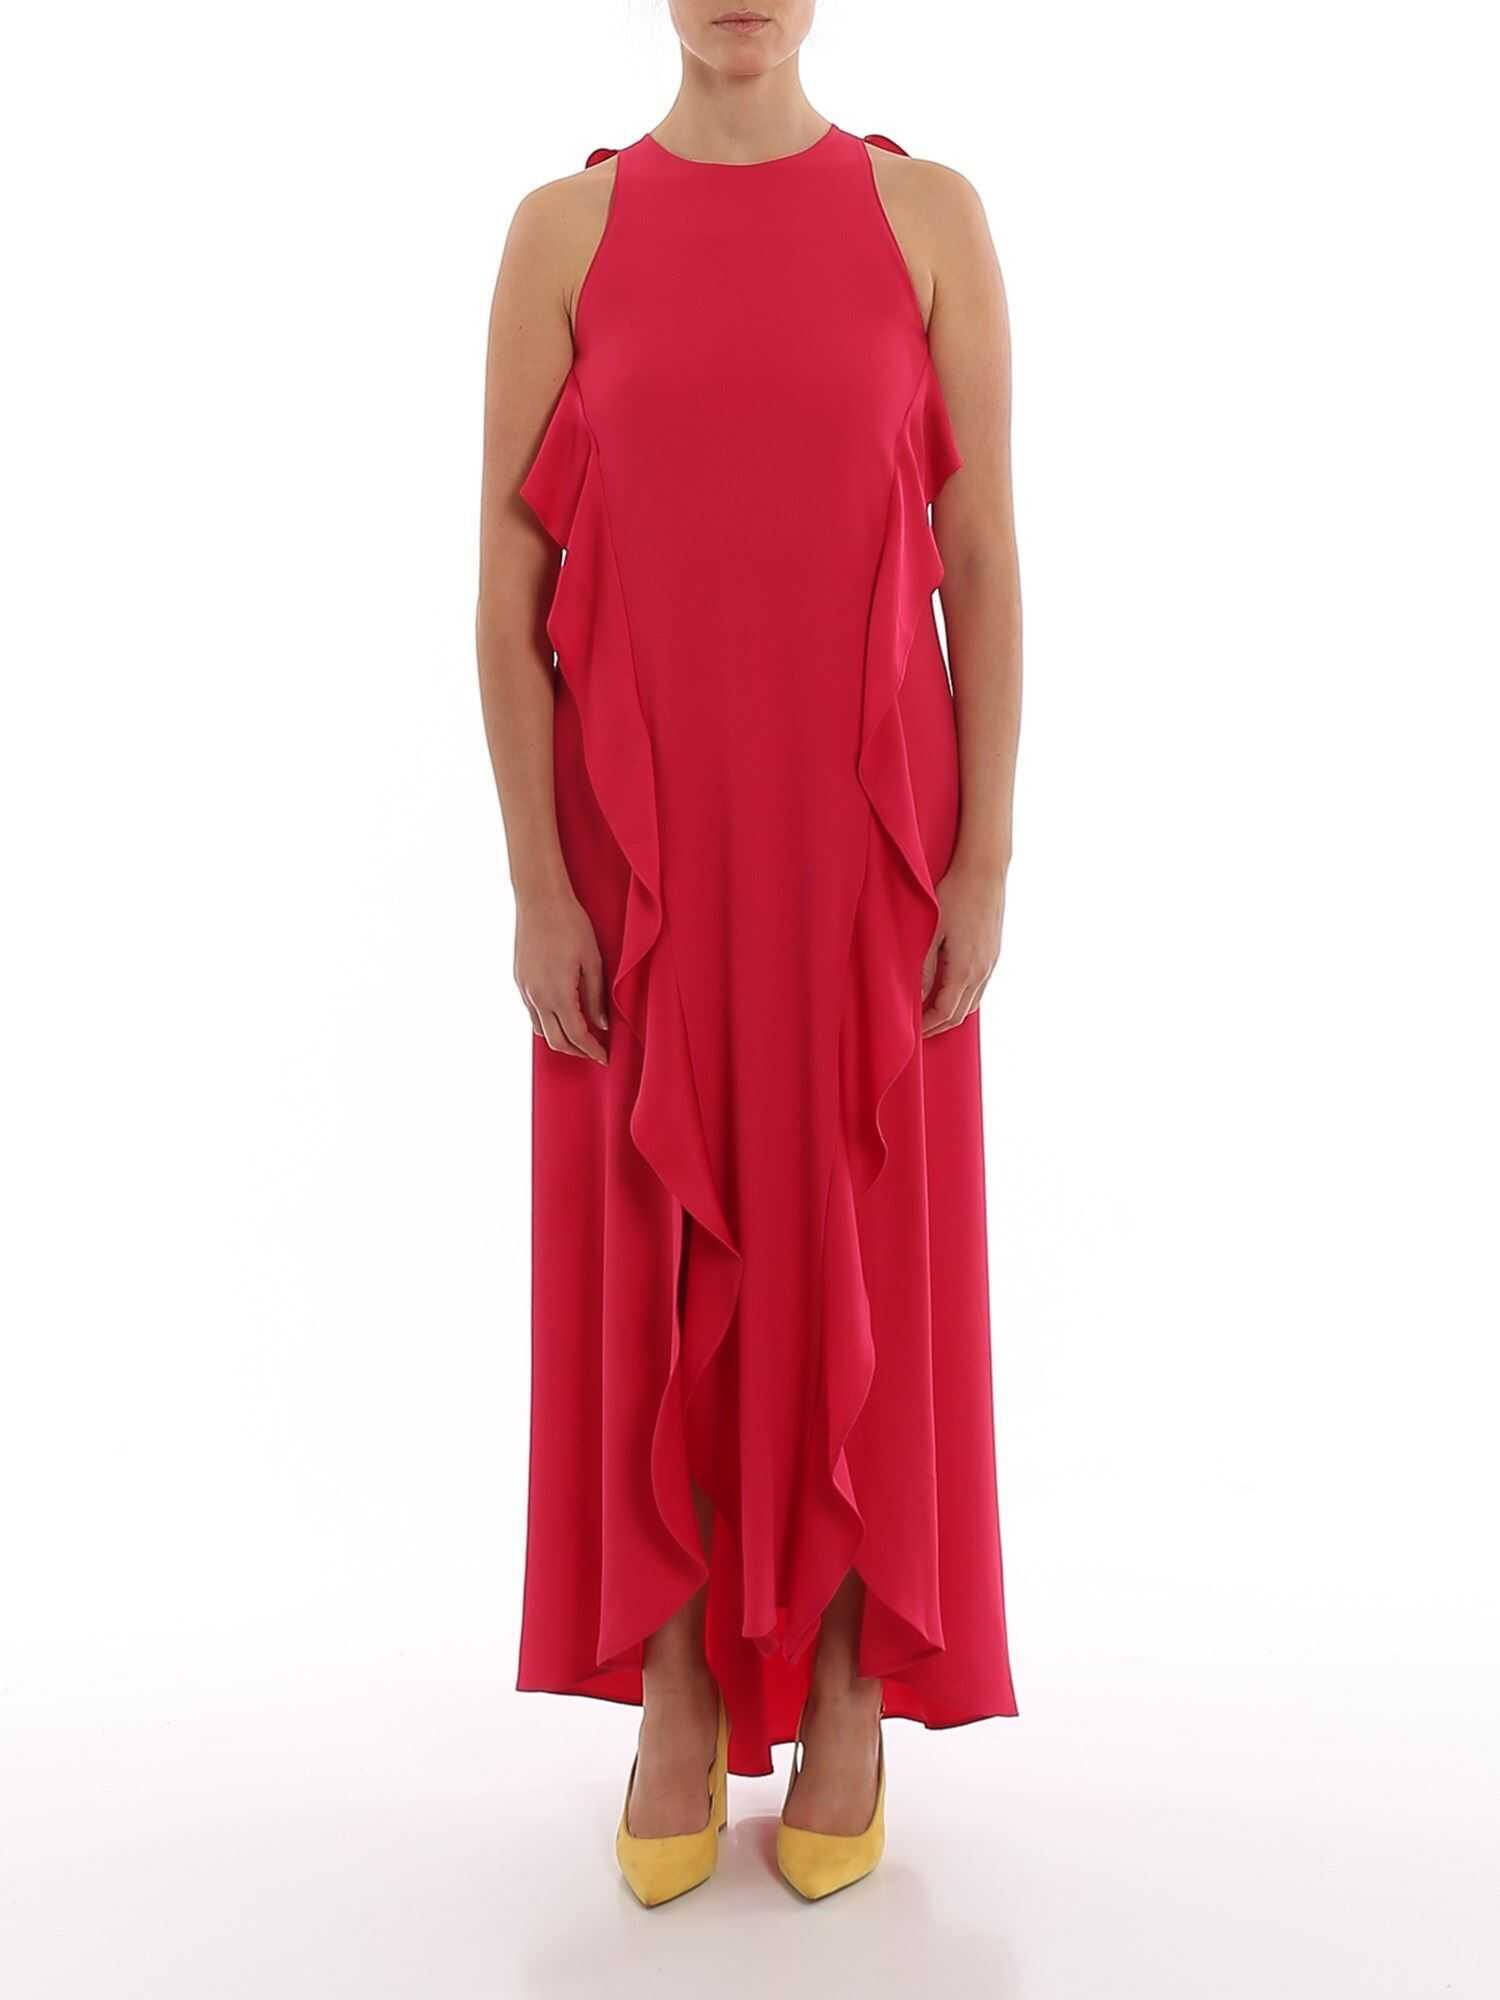 Twin-set Simona Barbieri Ruffled Crepe Envers Satin Dress In Fuchsia Fuchsia